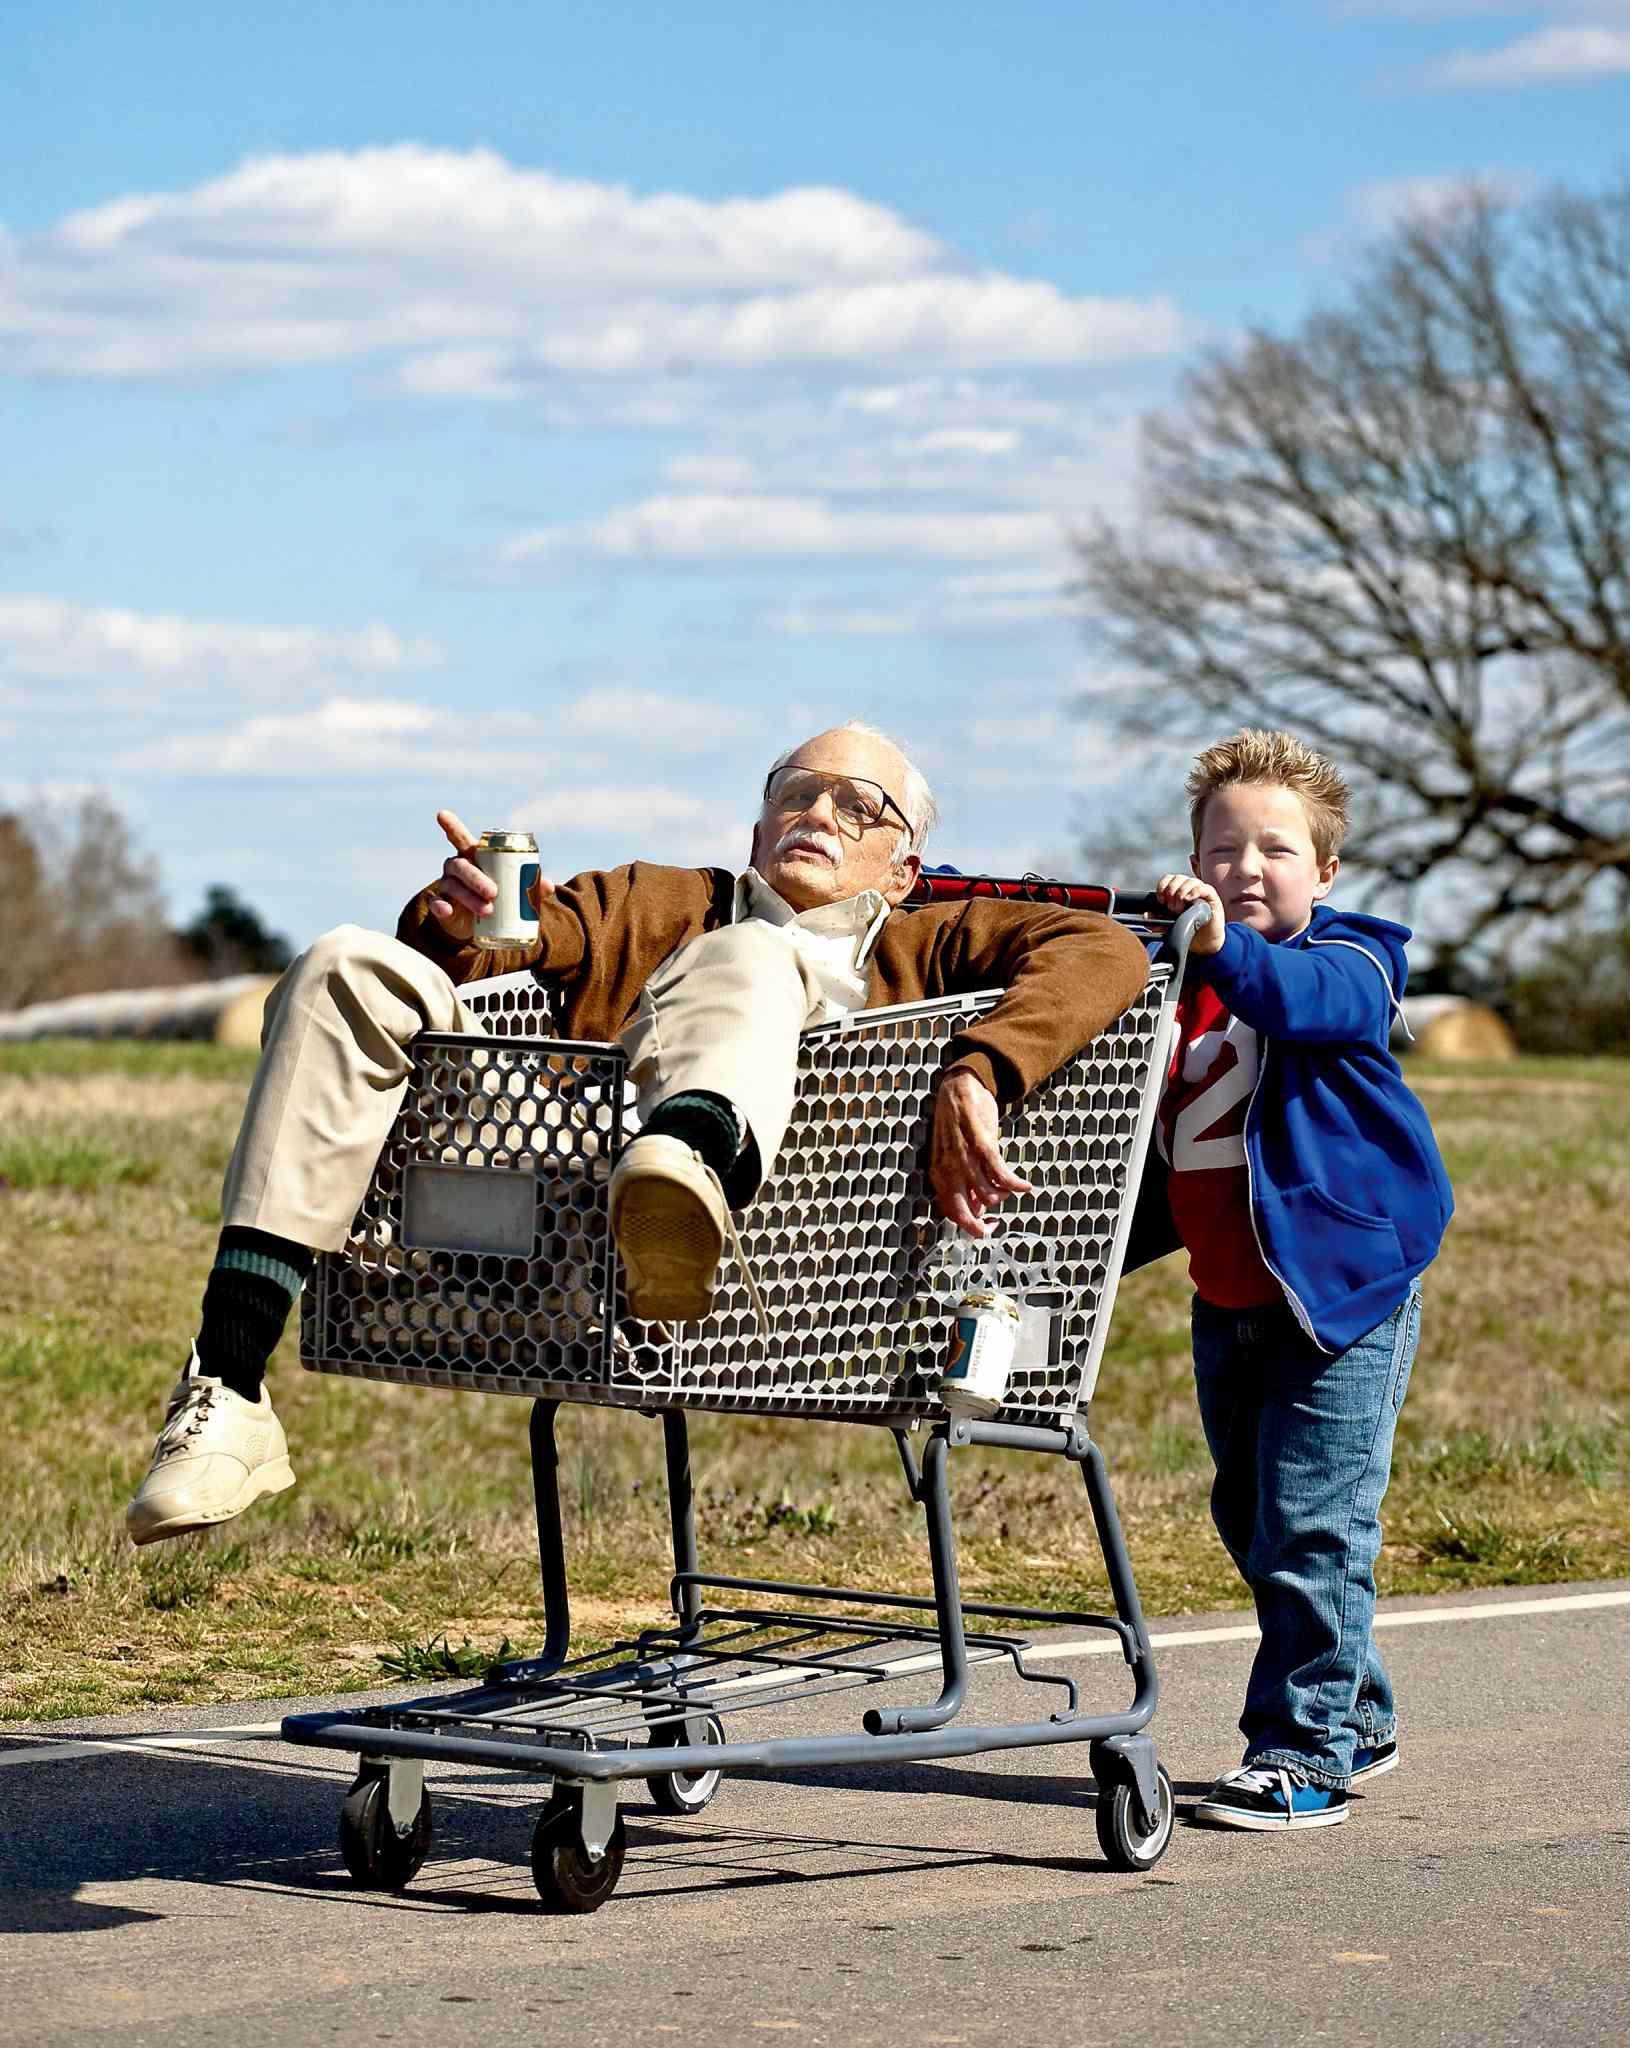 Скорби открытка, смешная картинка про дедушку